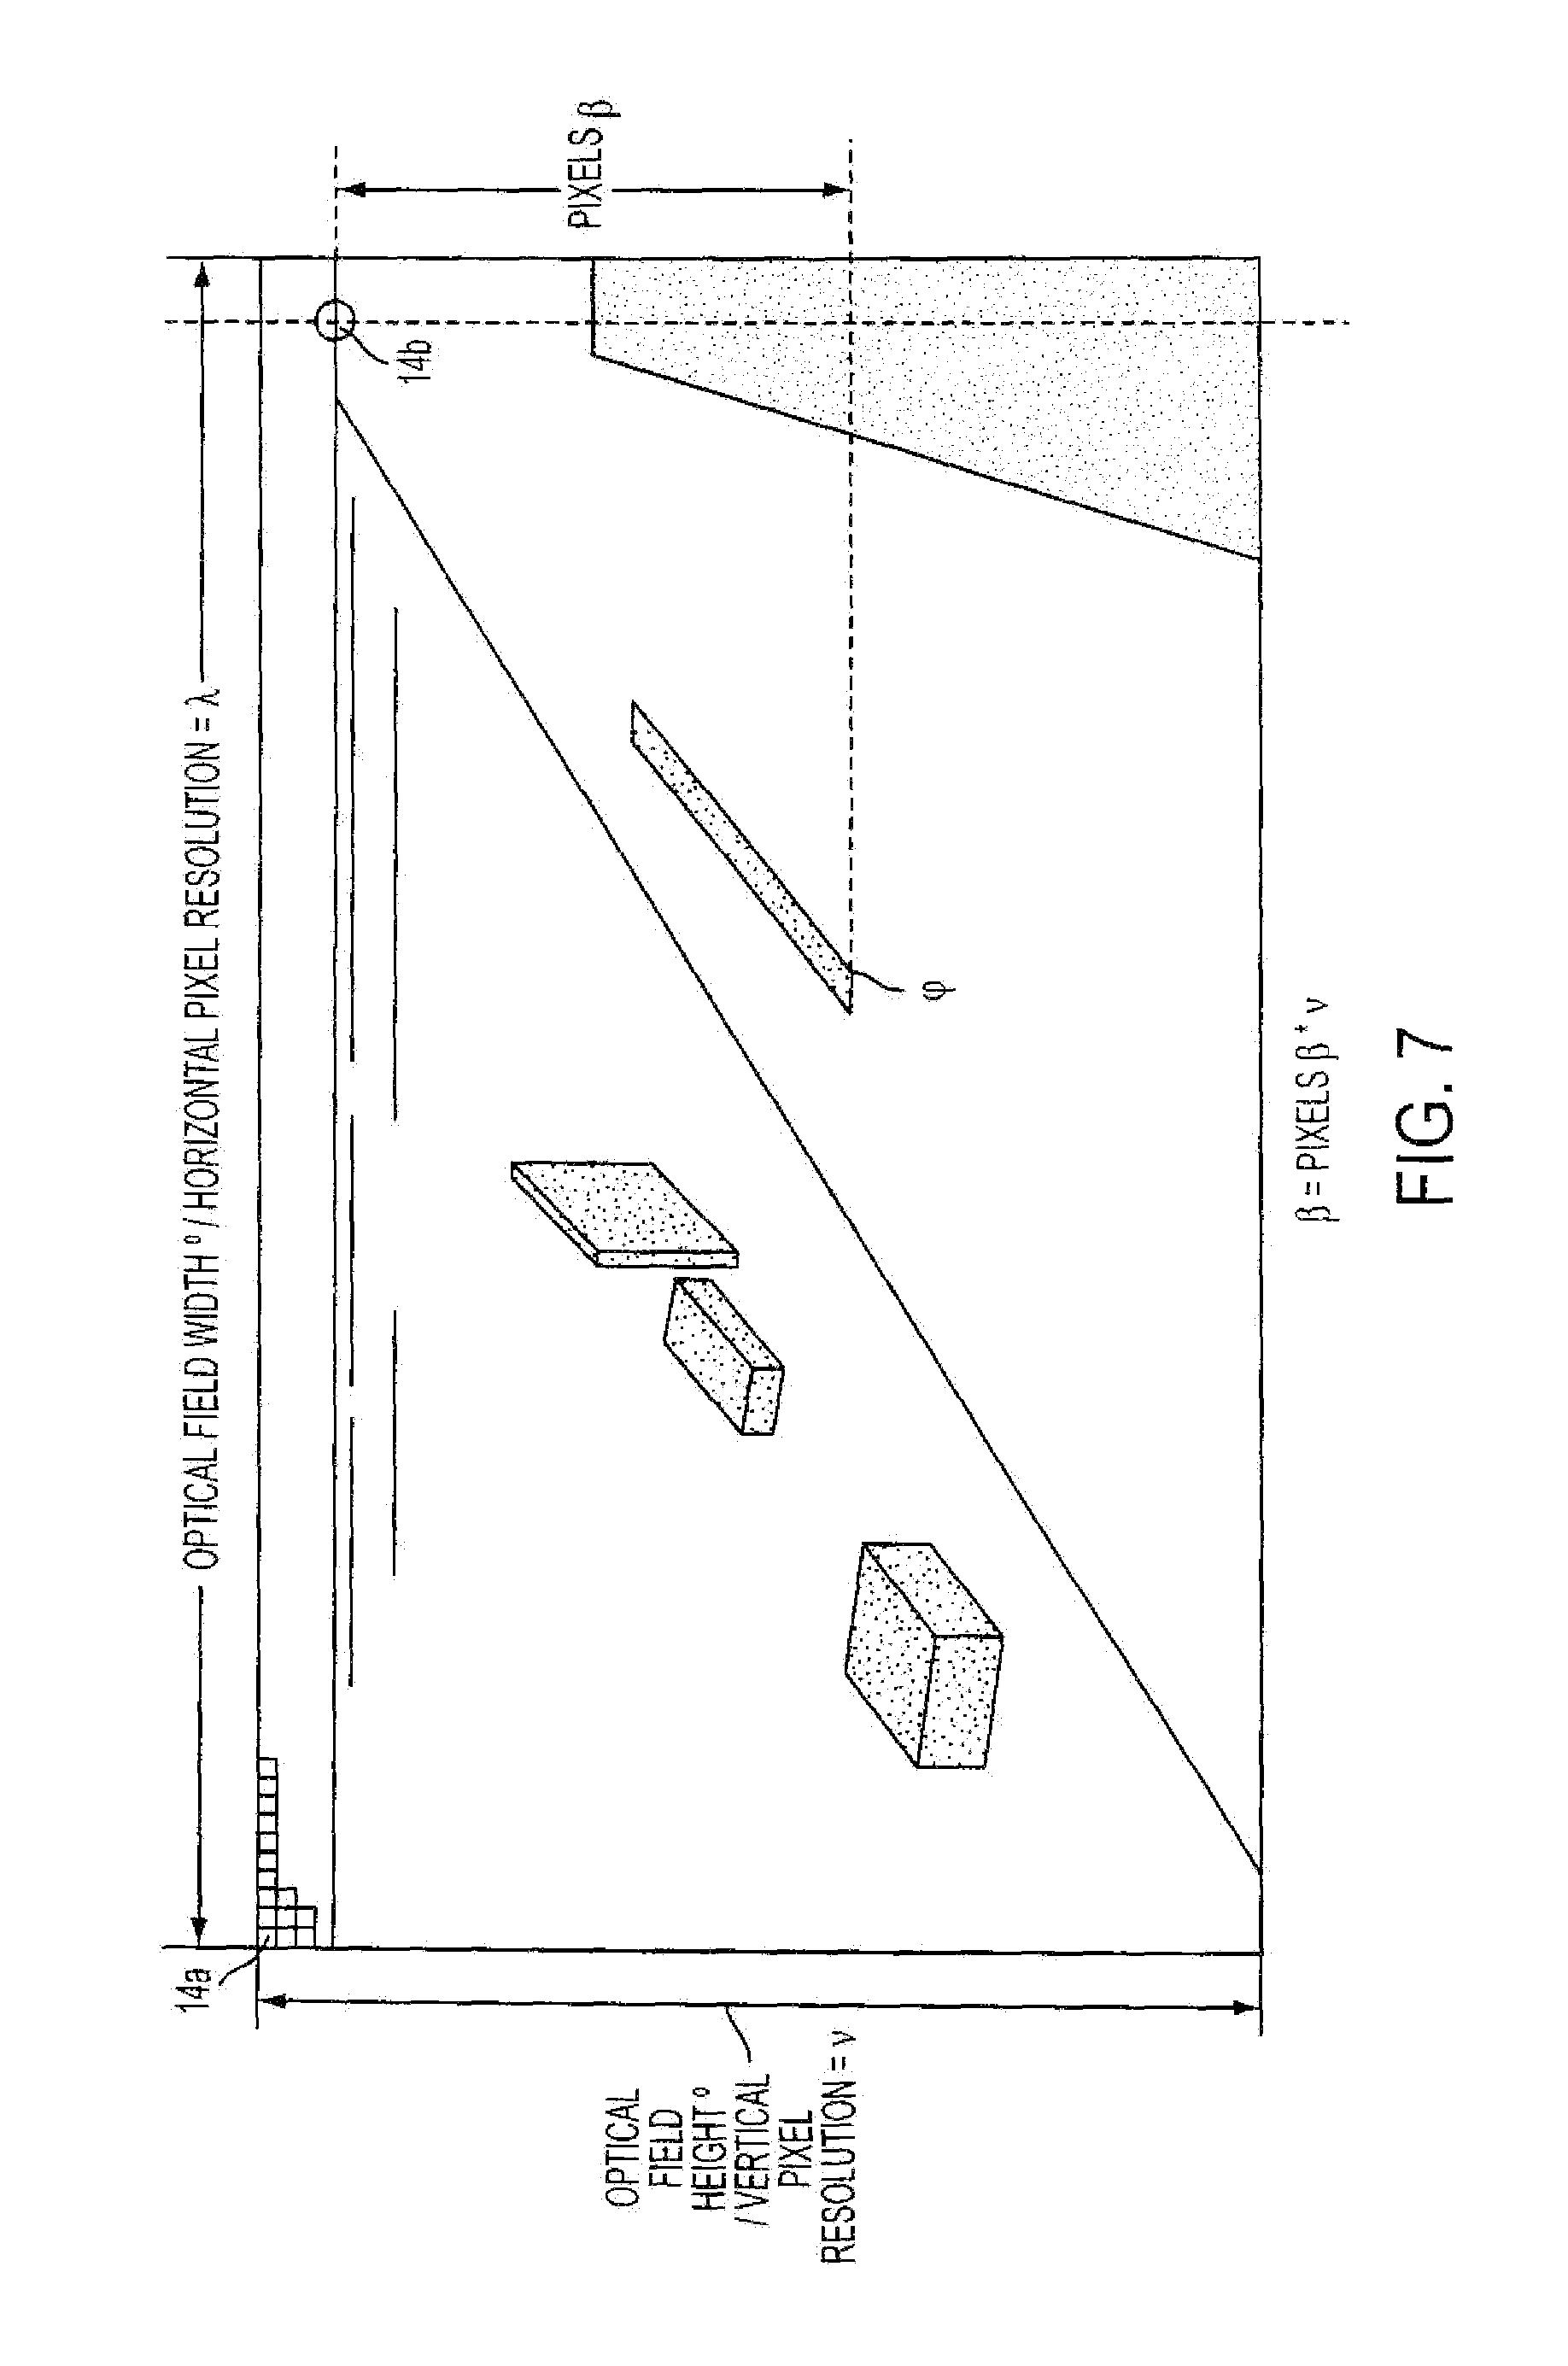 Patent US 9,171,217 B2